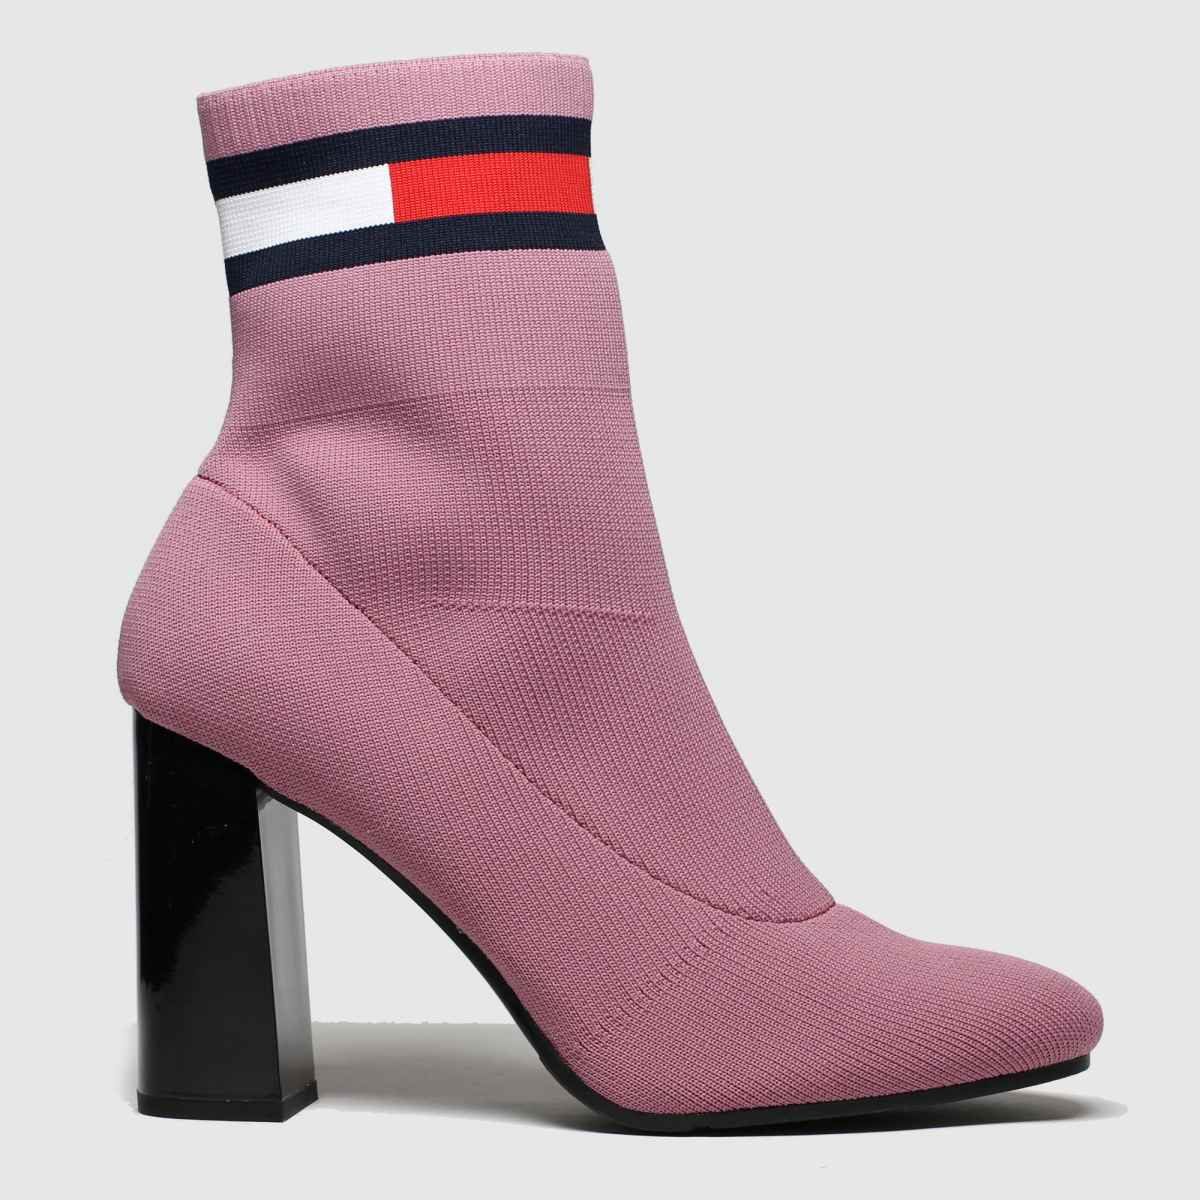 Tommy Hilfiger Pink Sock Heeled Boots